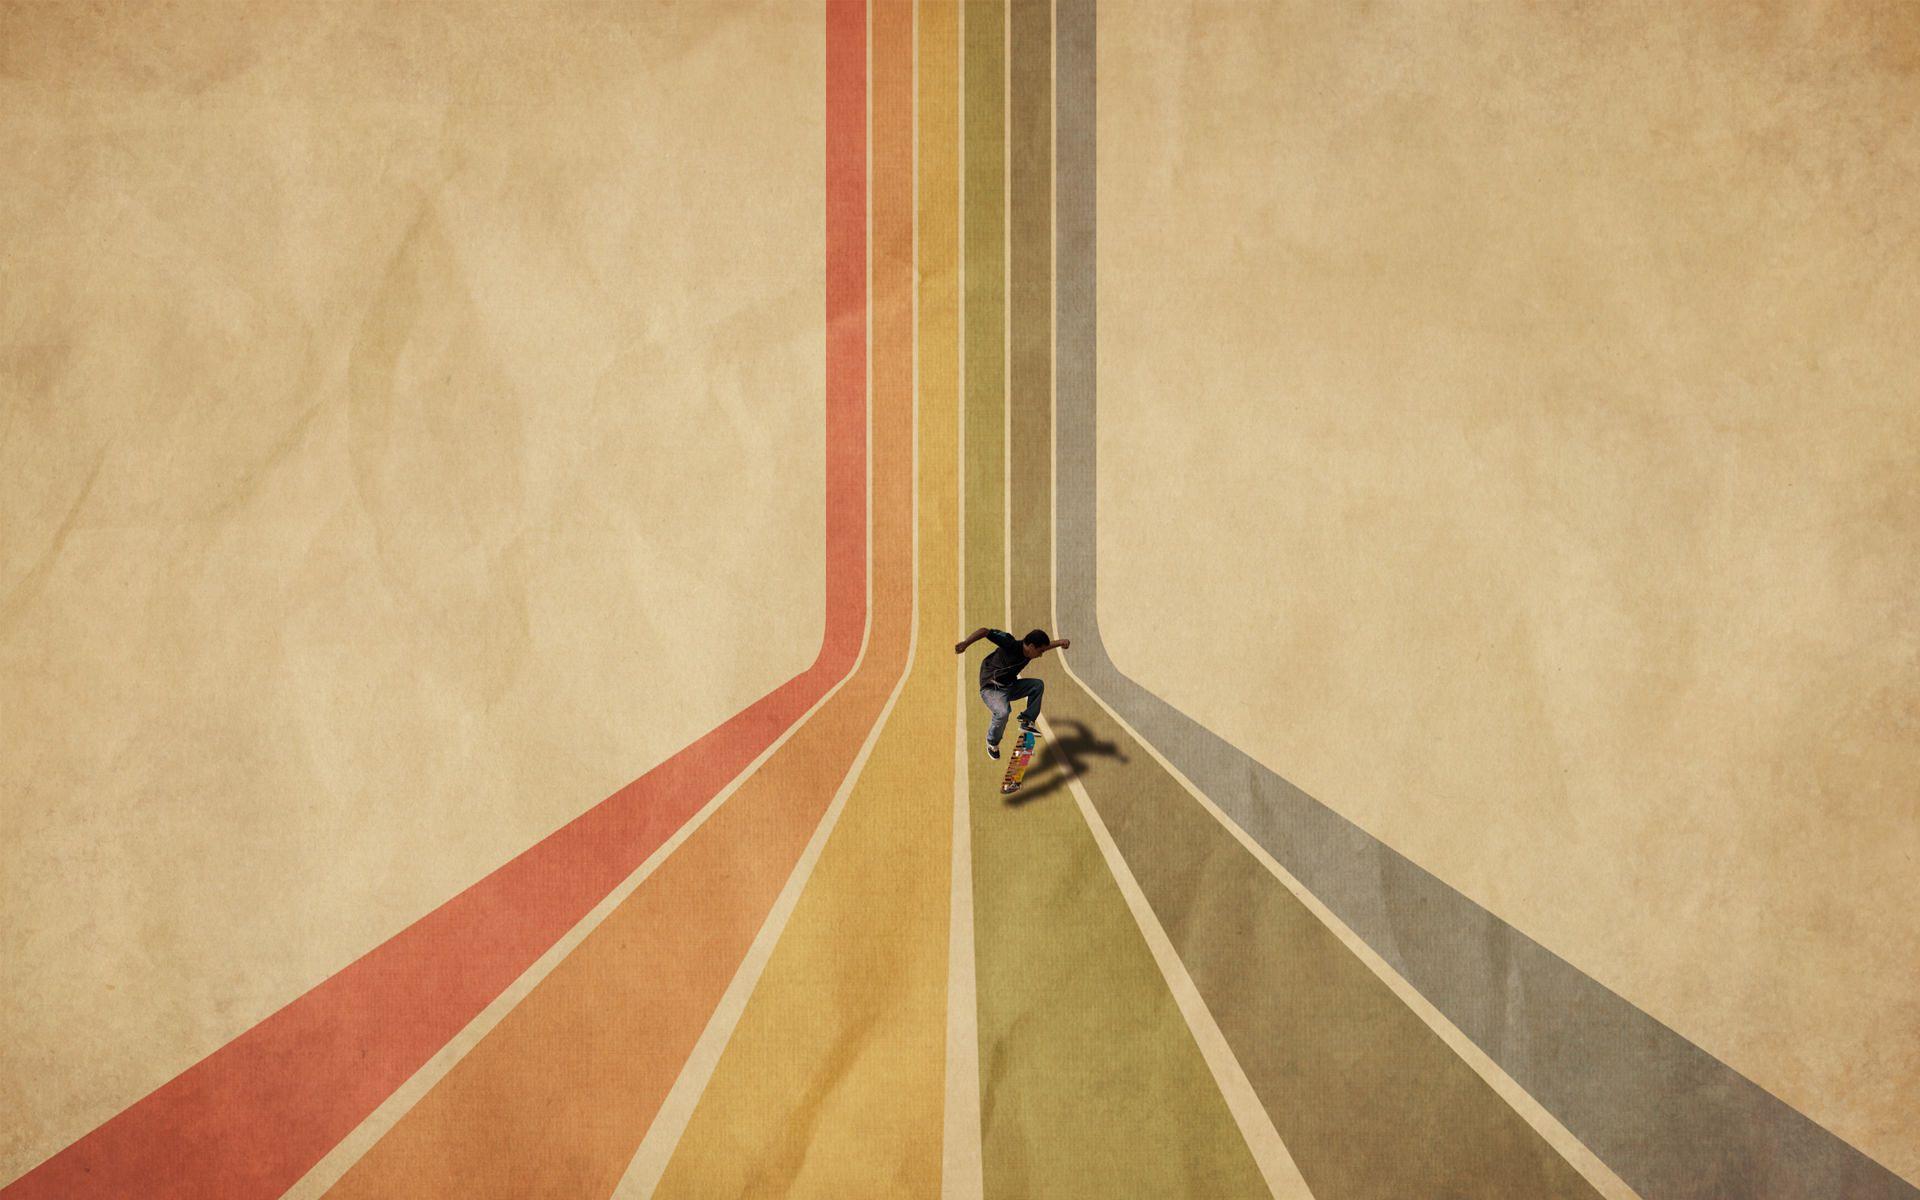 Retro Rainbow Stripes Wallpaper Supercolortuts Vintage Desktop Wallpapers Clouds Design Retro Wallpaper